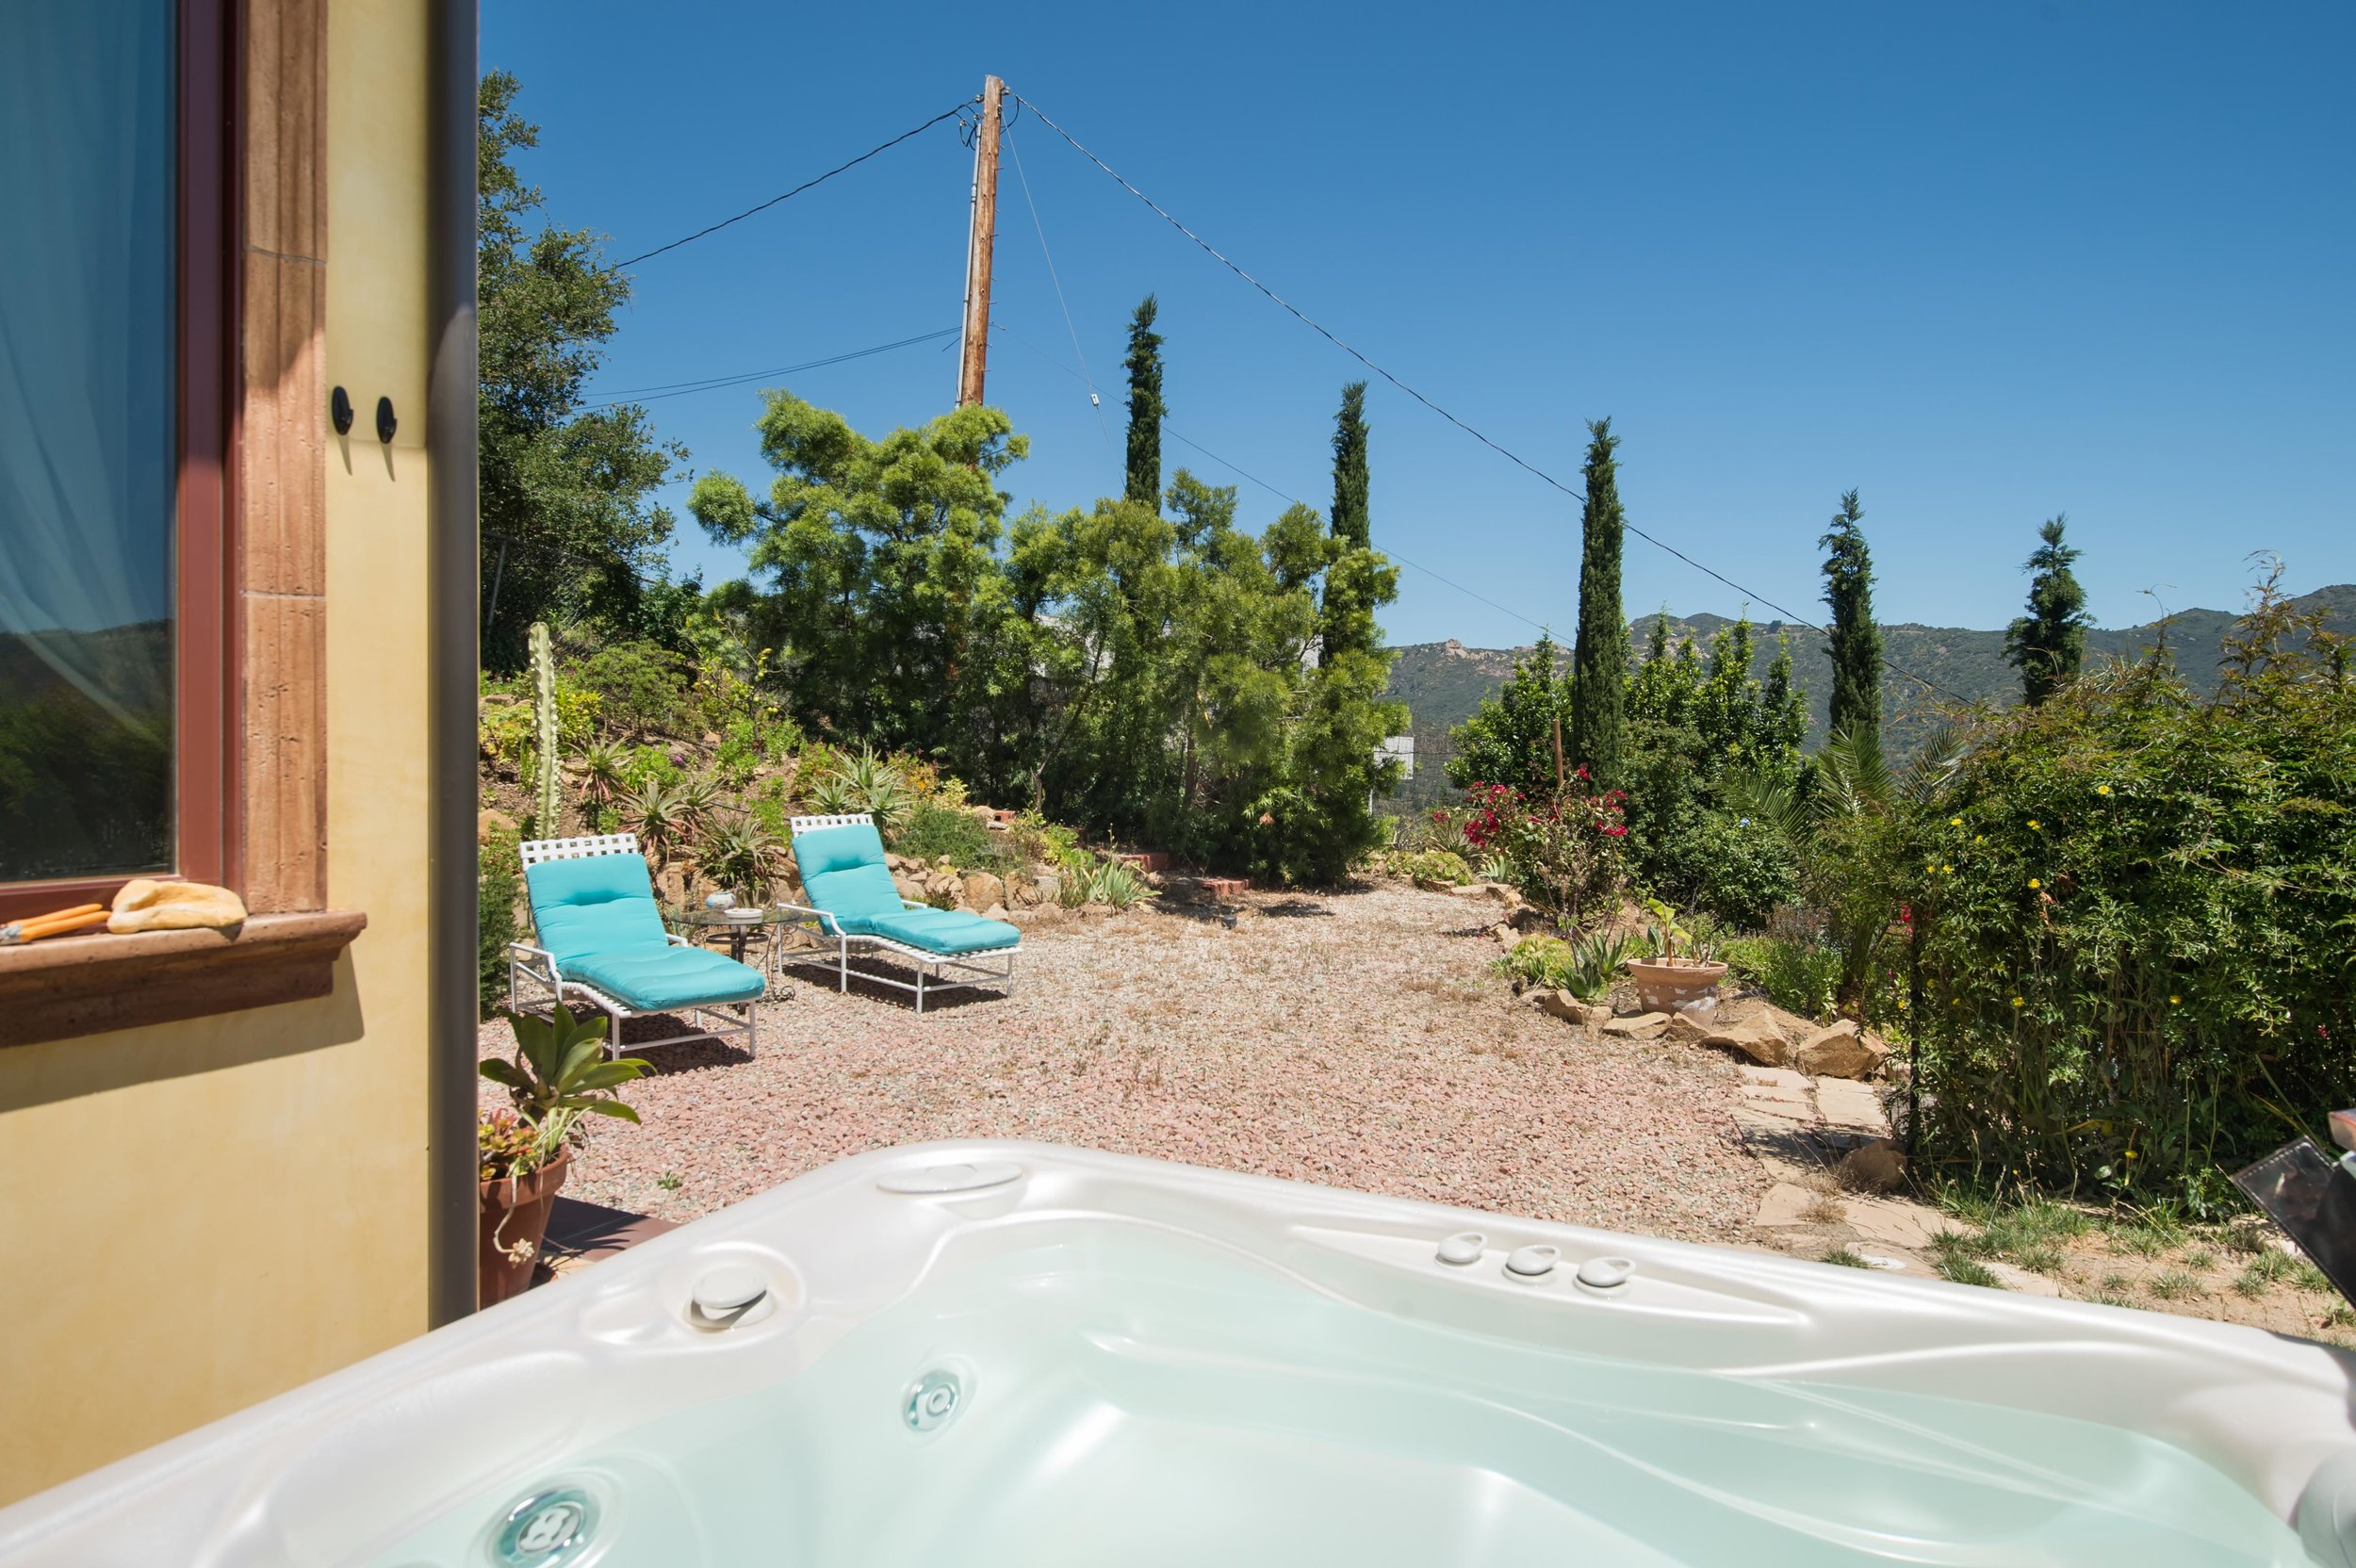 027 Backyard 26303 Lockwood Road Malibu For Sale Lease The Malibu Life Team Luxury Real Estate.jpg